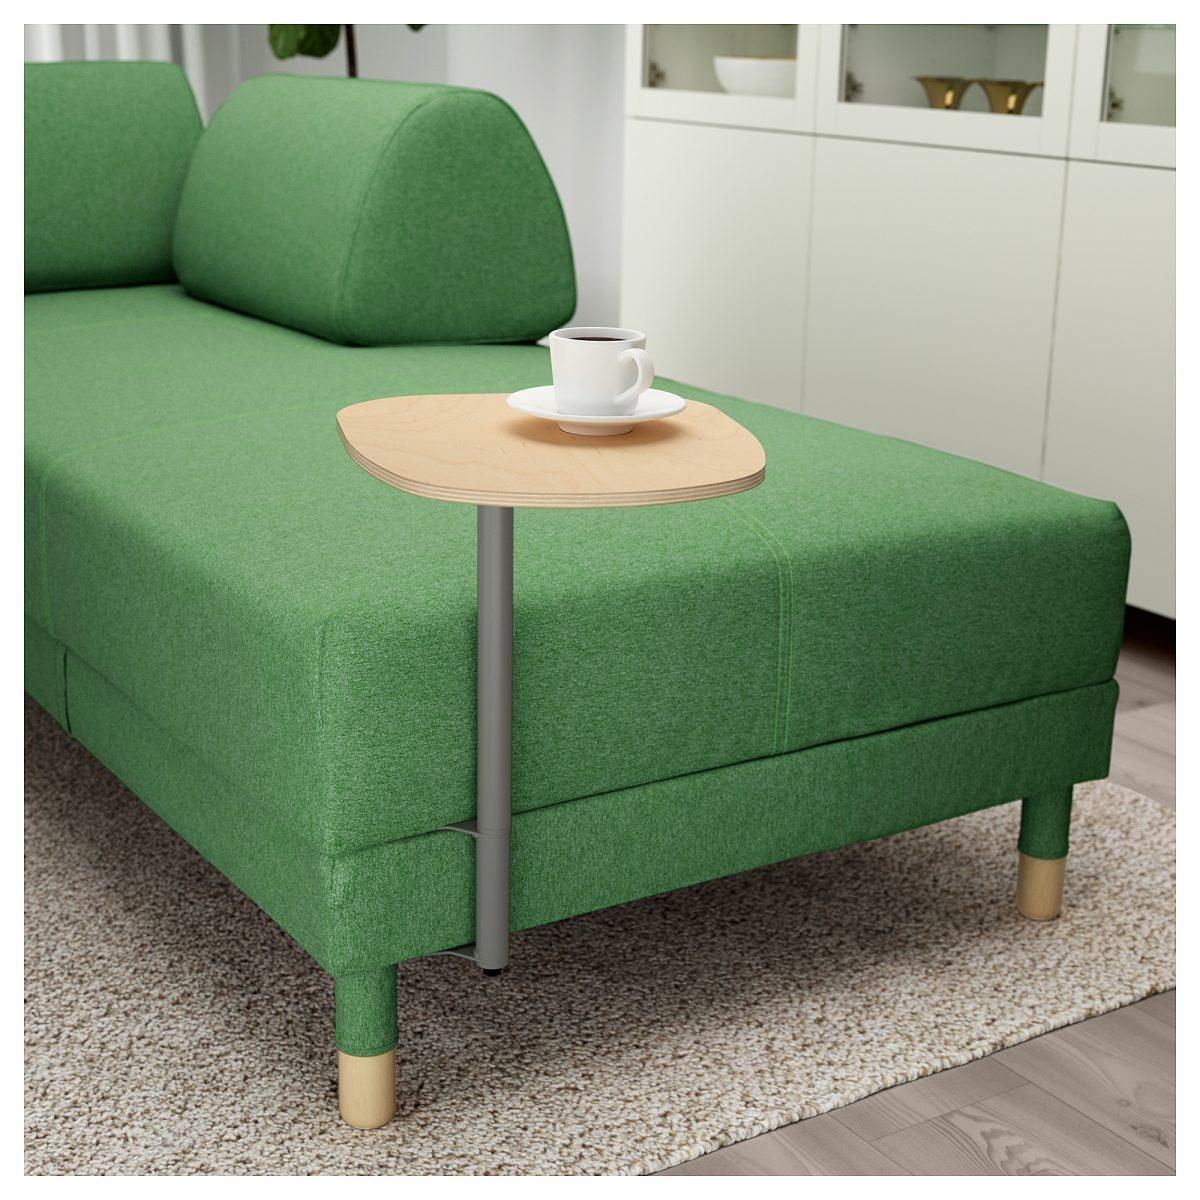 divano-letto-ikea-flottebo-tavolino